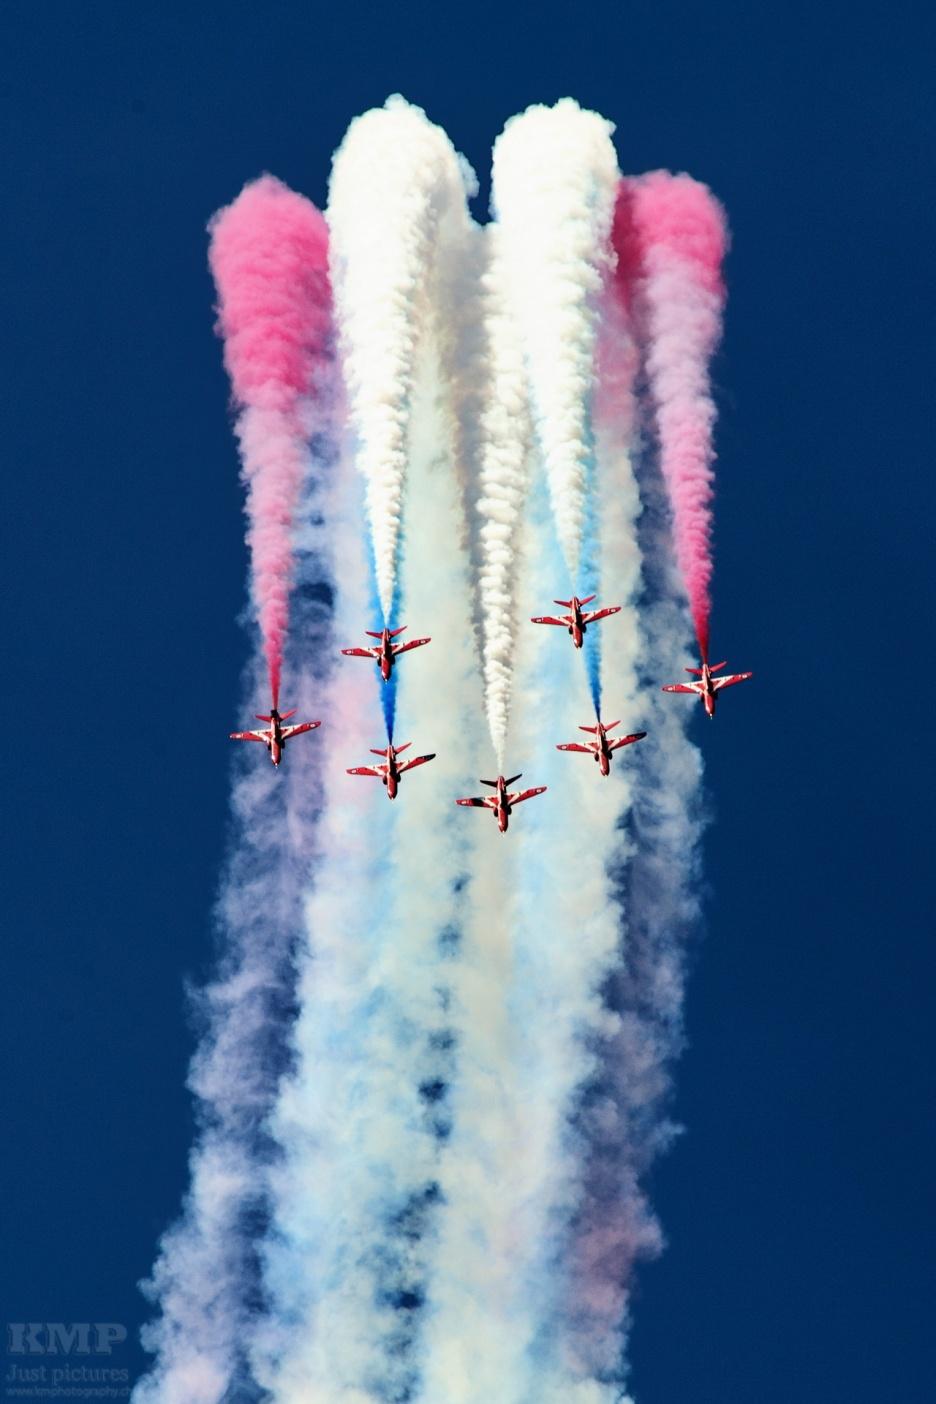 RAF Aerobatic Team Red Arrows